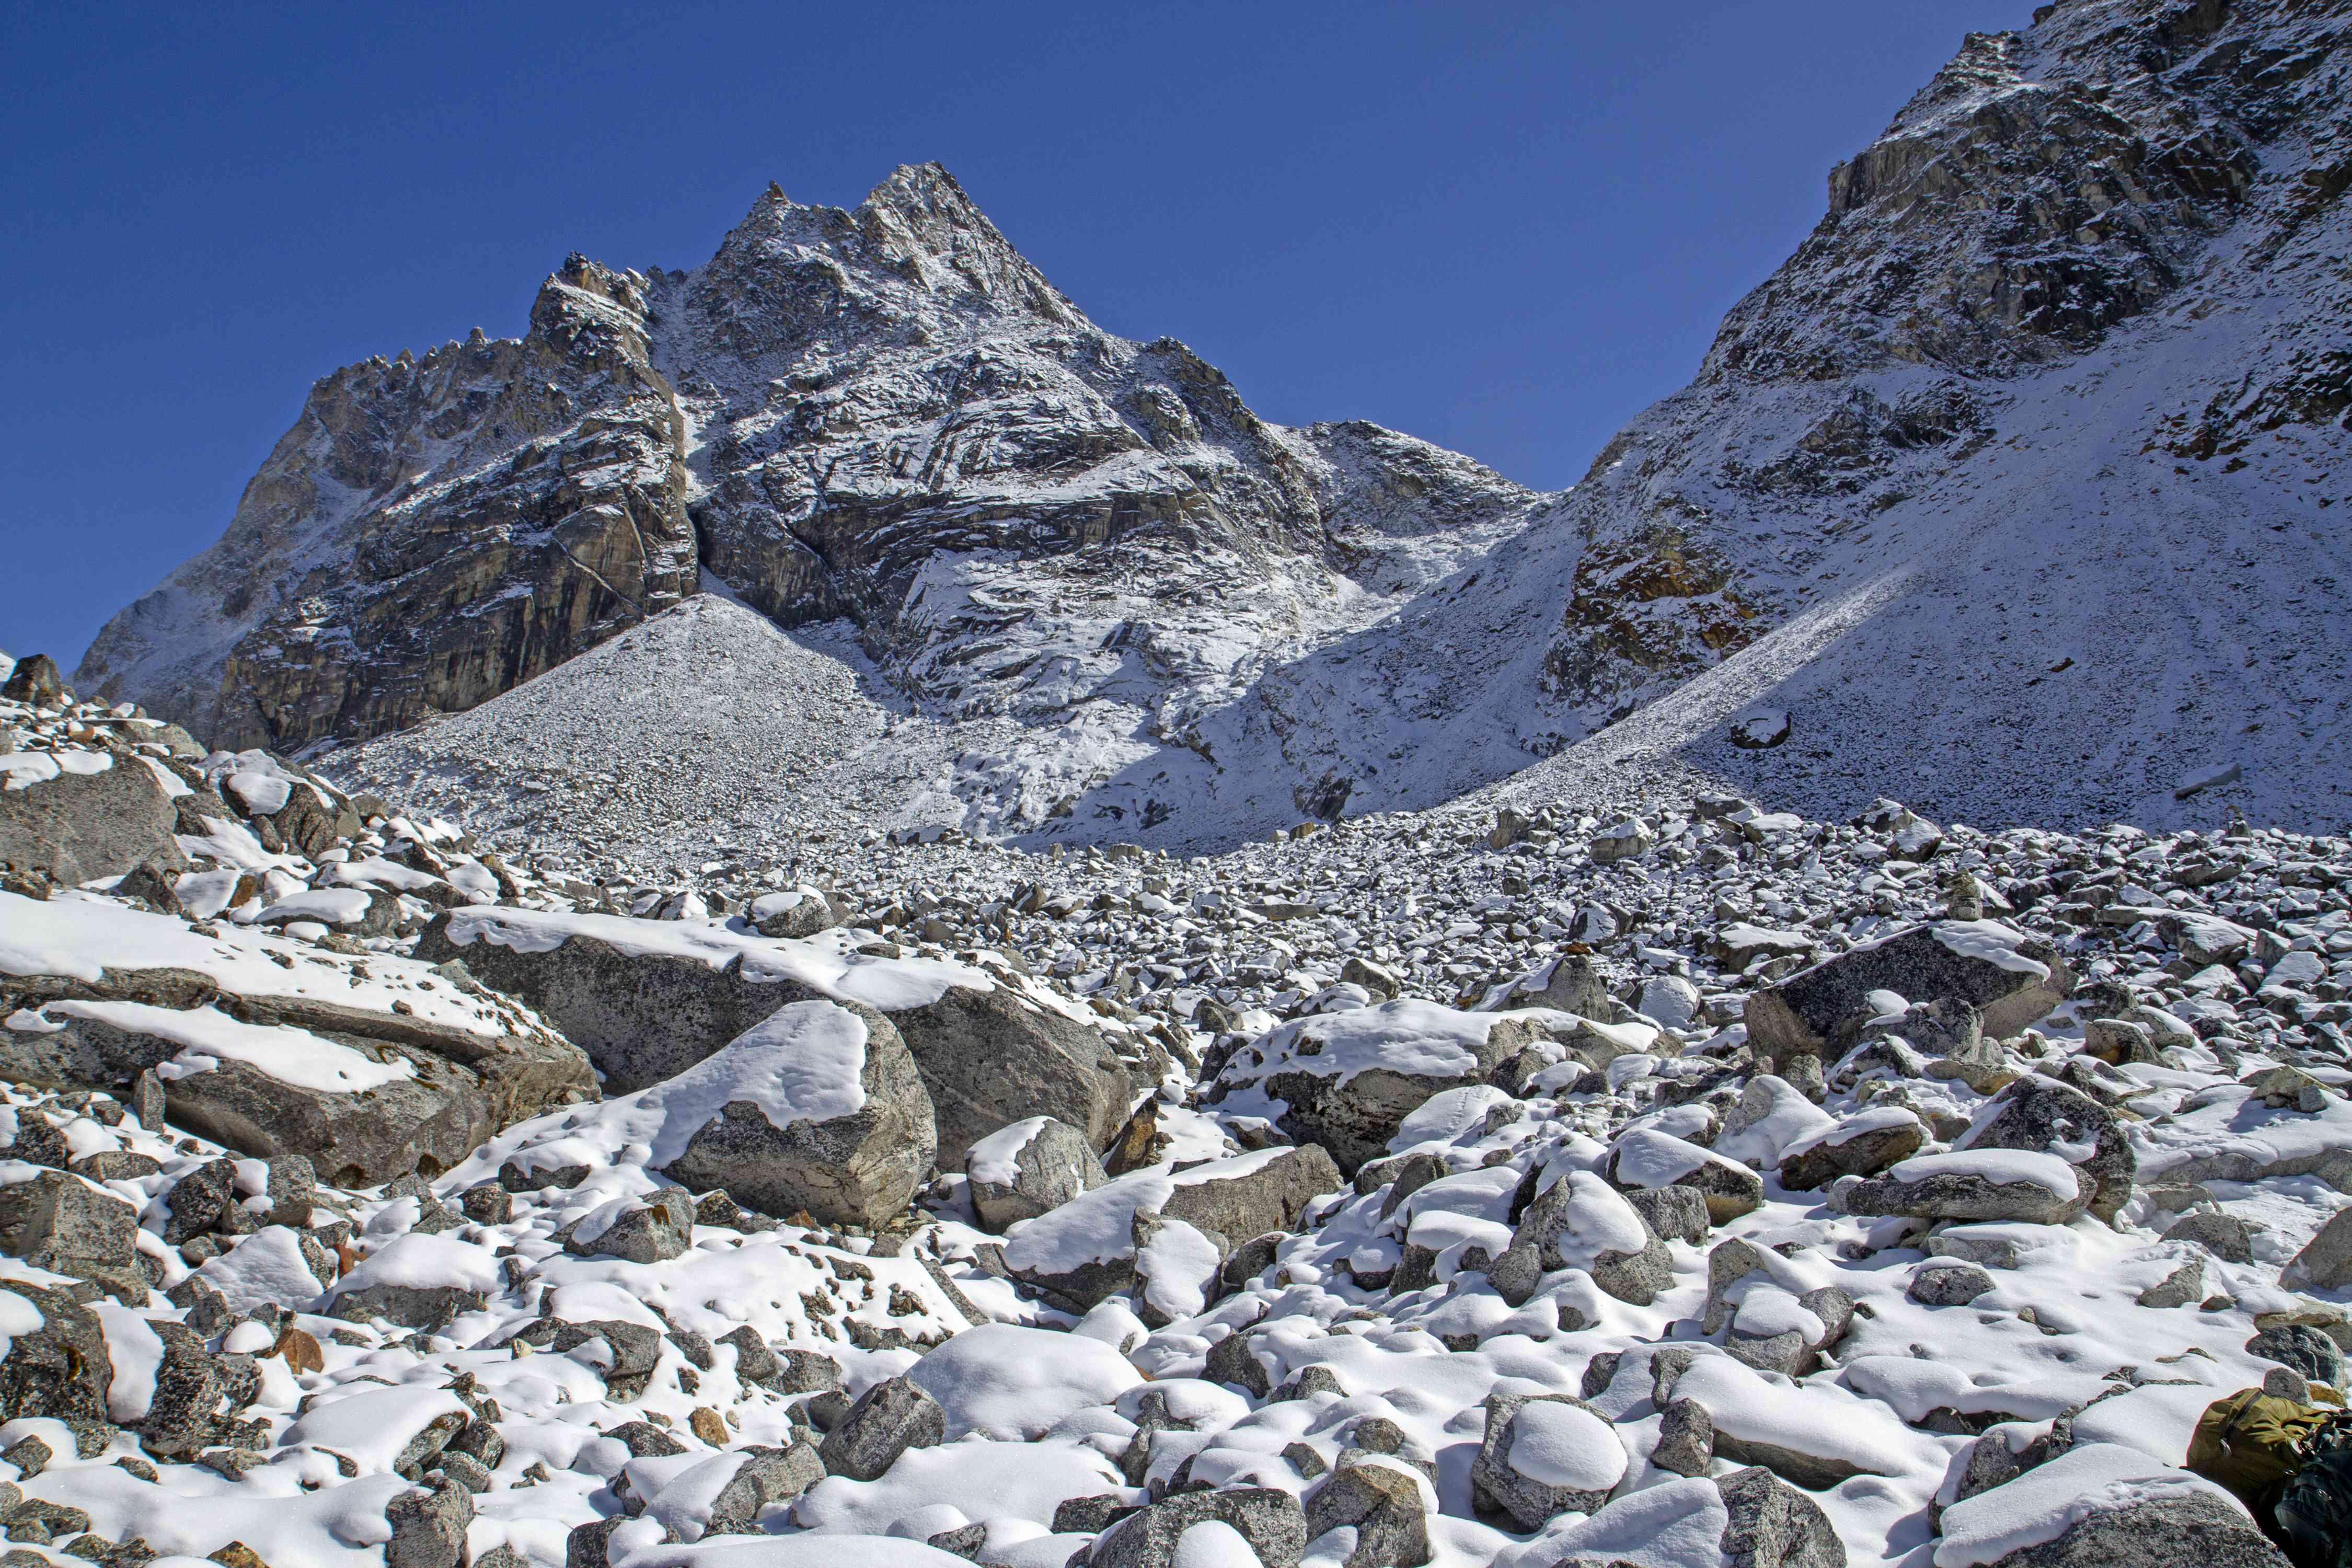 The Cho La Pass in Nepal